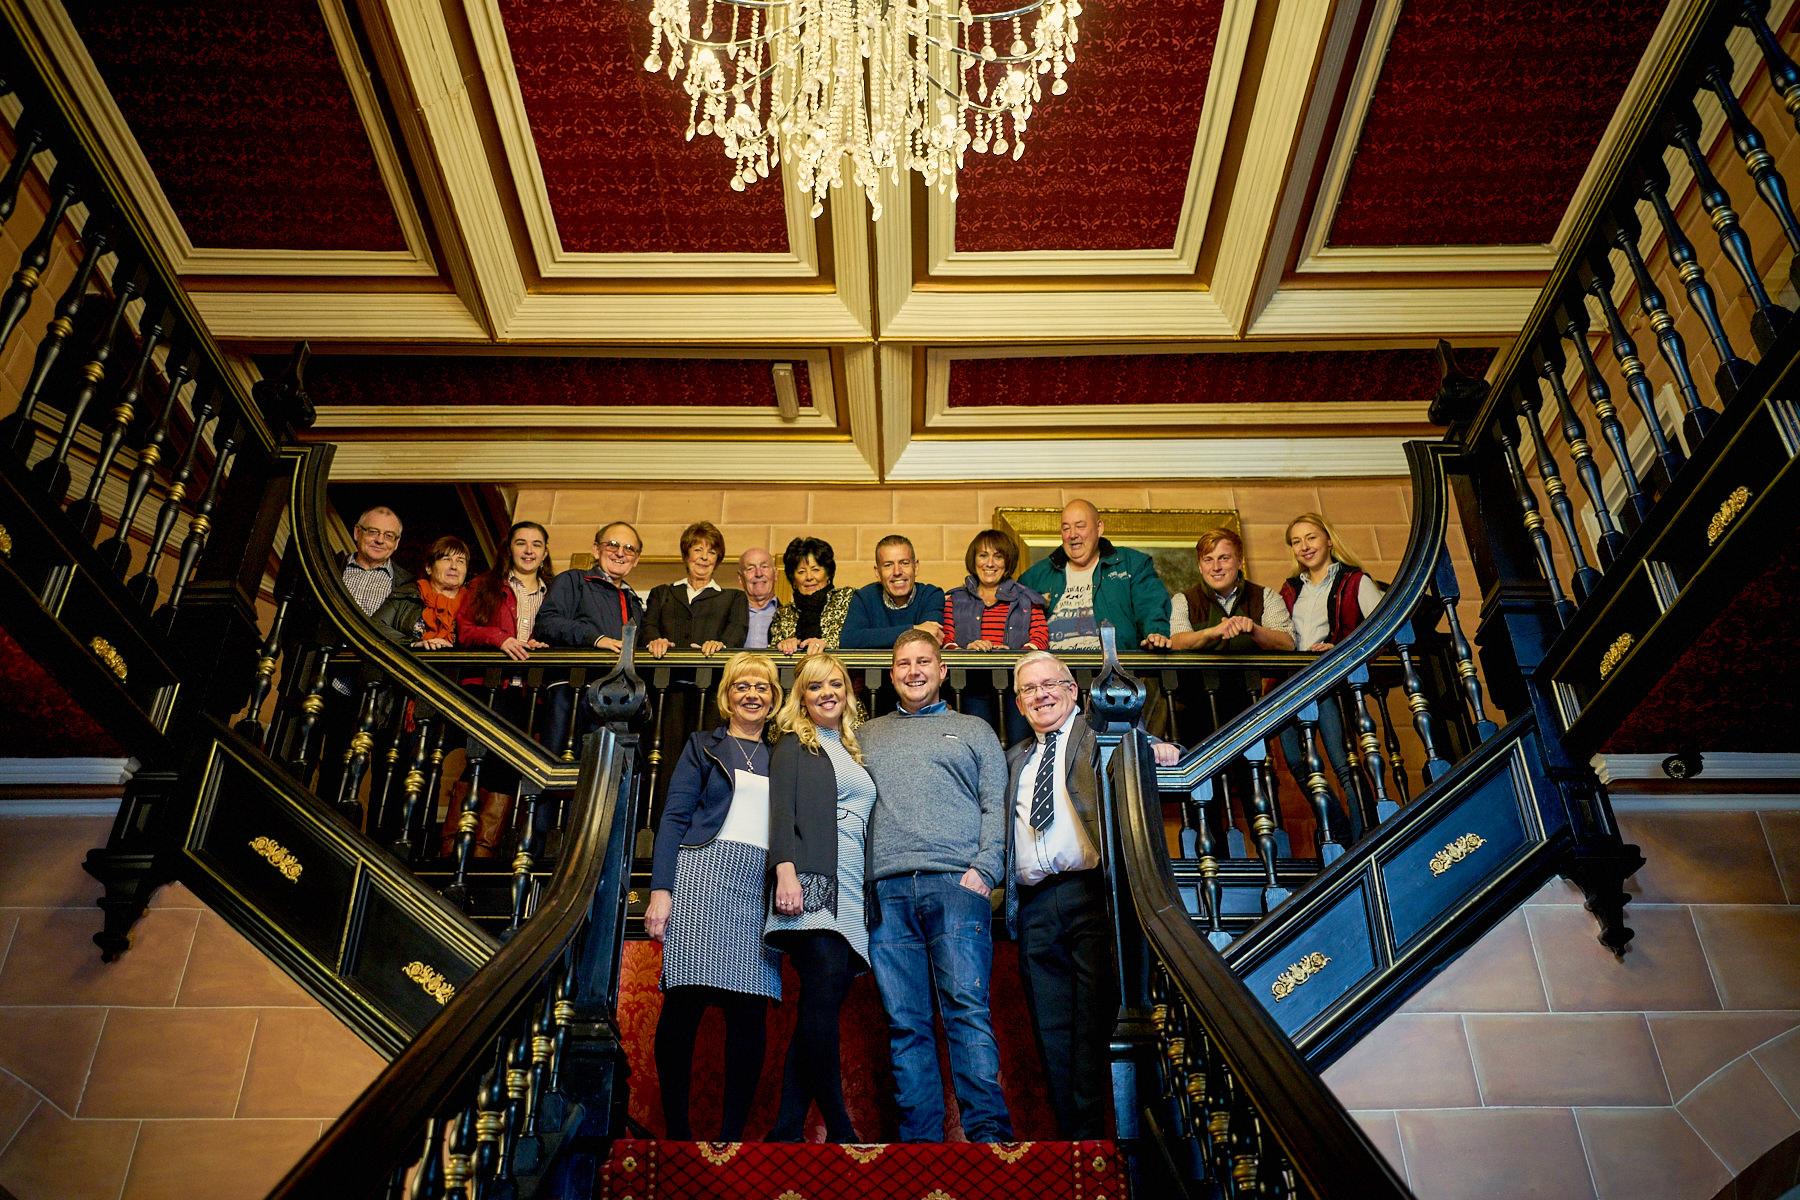 Maenan Abbey Stair Case